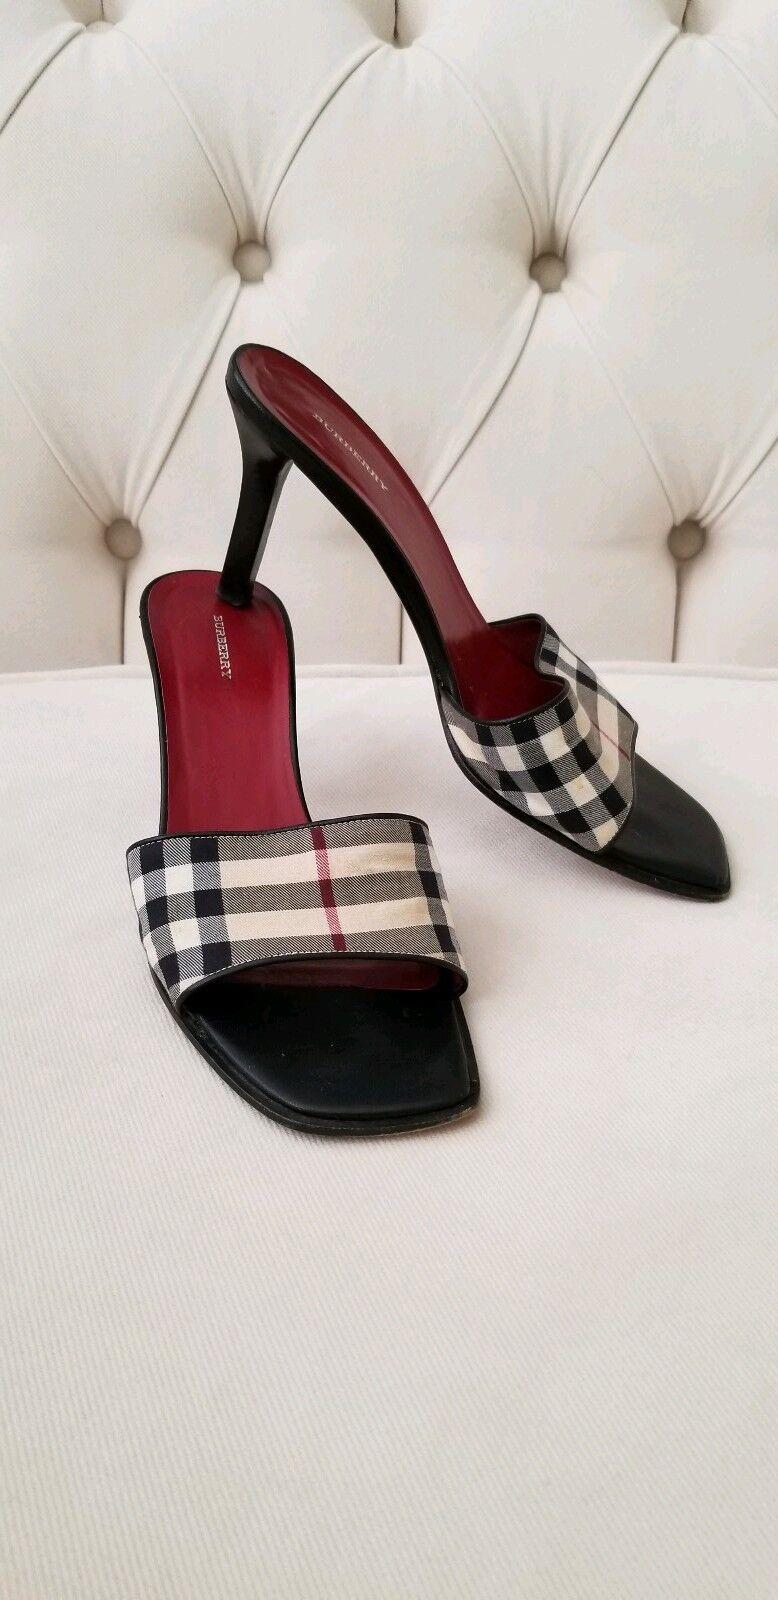 BURBERRY 8.5 M Black Classic Plaid Slide on Sandals Heels Heels Heels Canvas & Leather 38.5 6c41e4